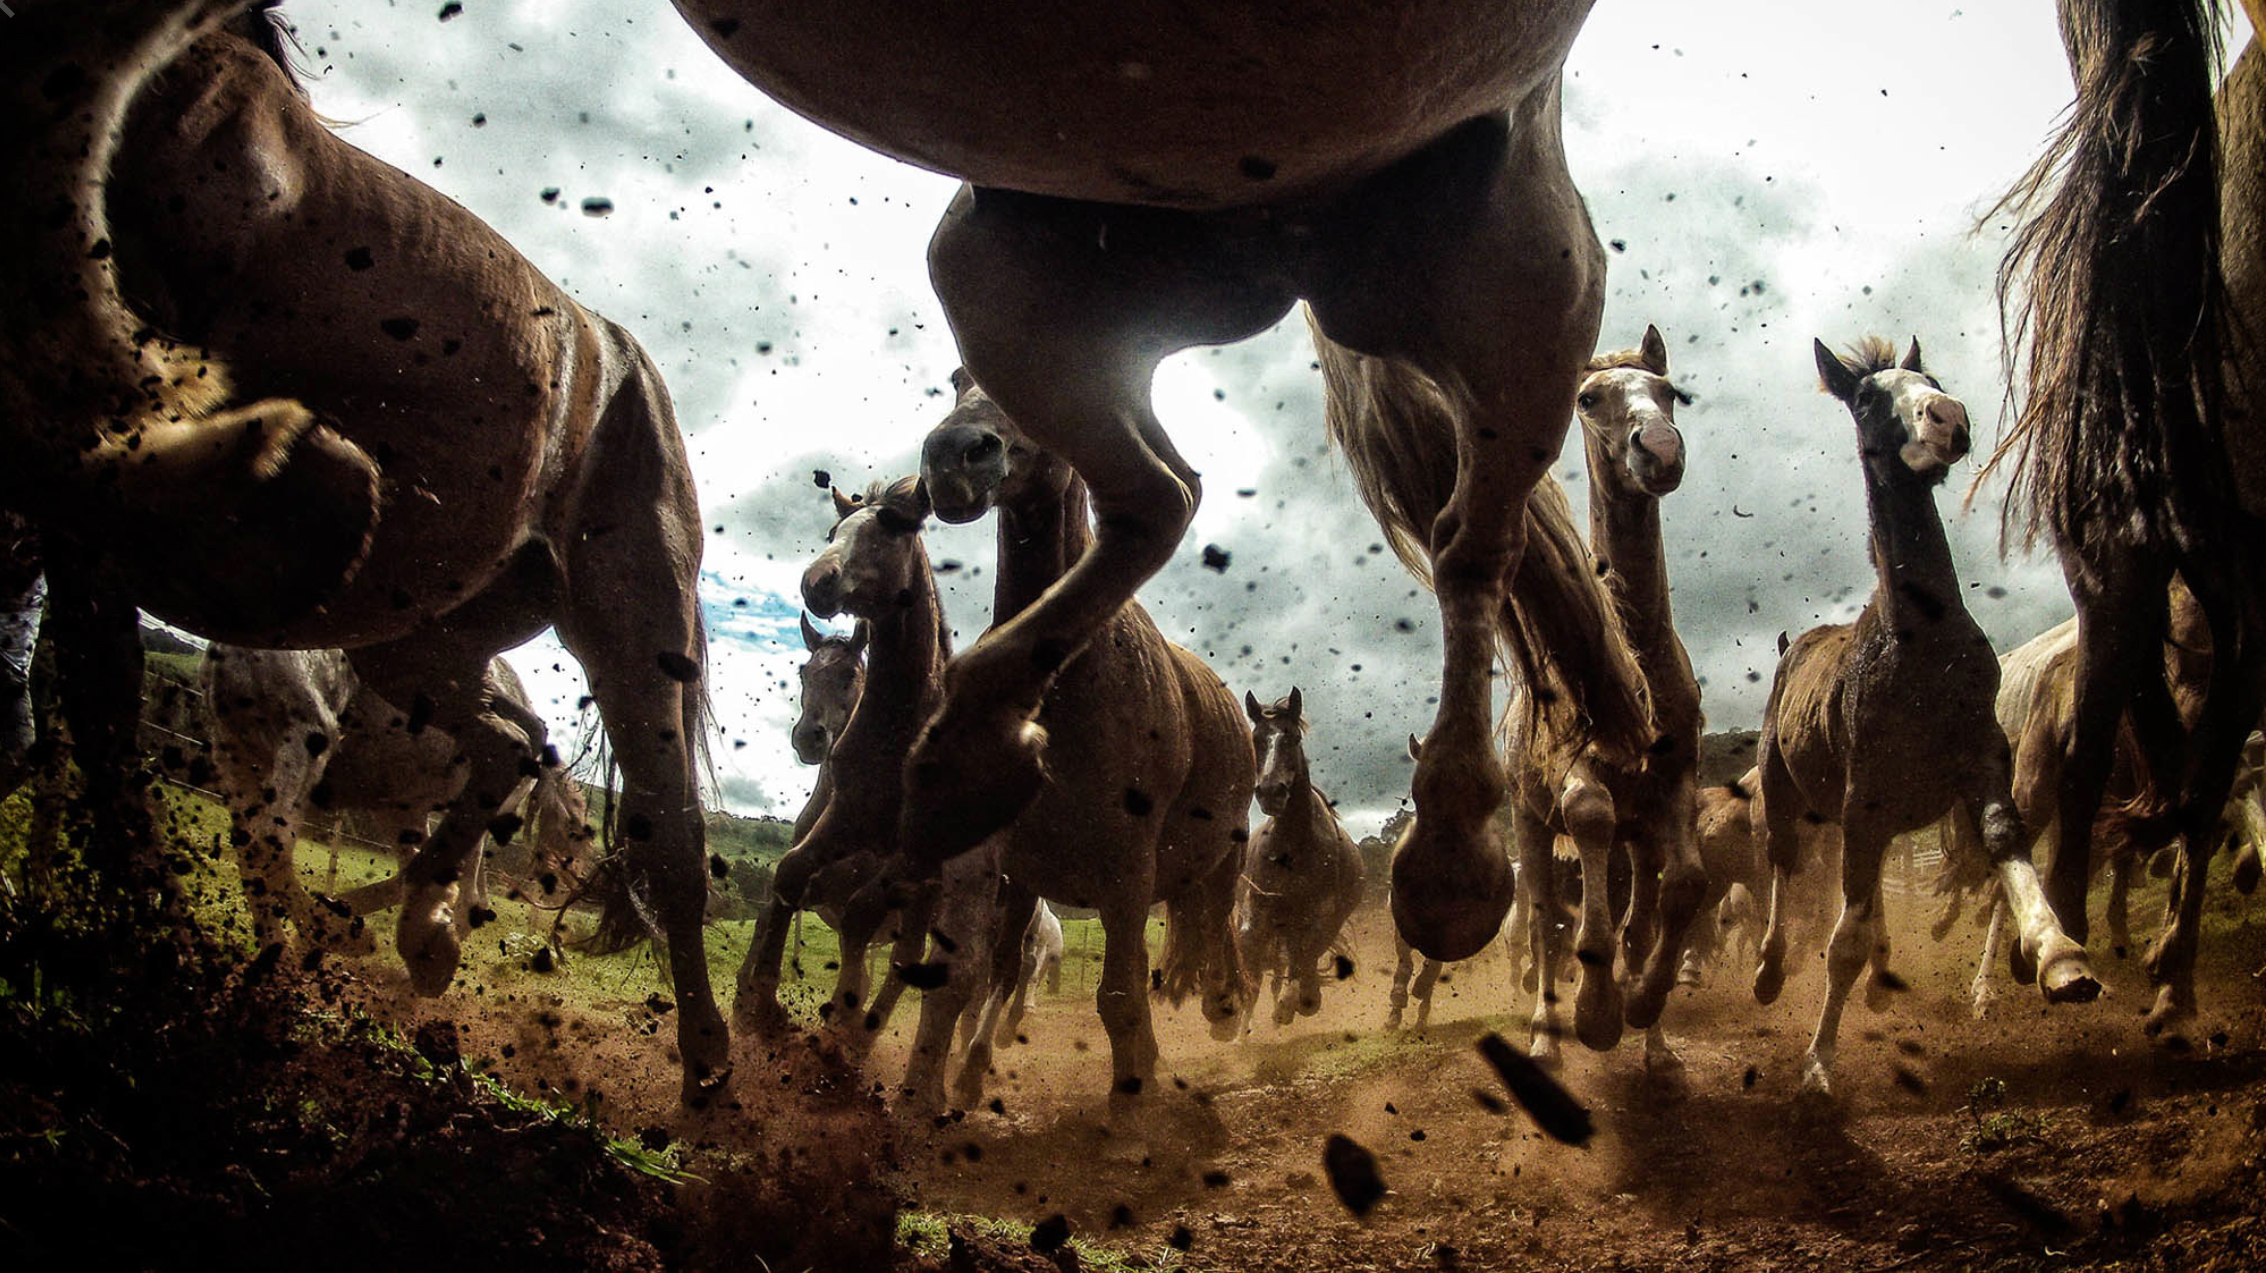 Chris Schmid – horses – photography nature, sport